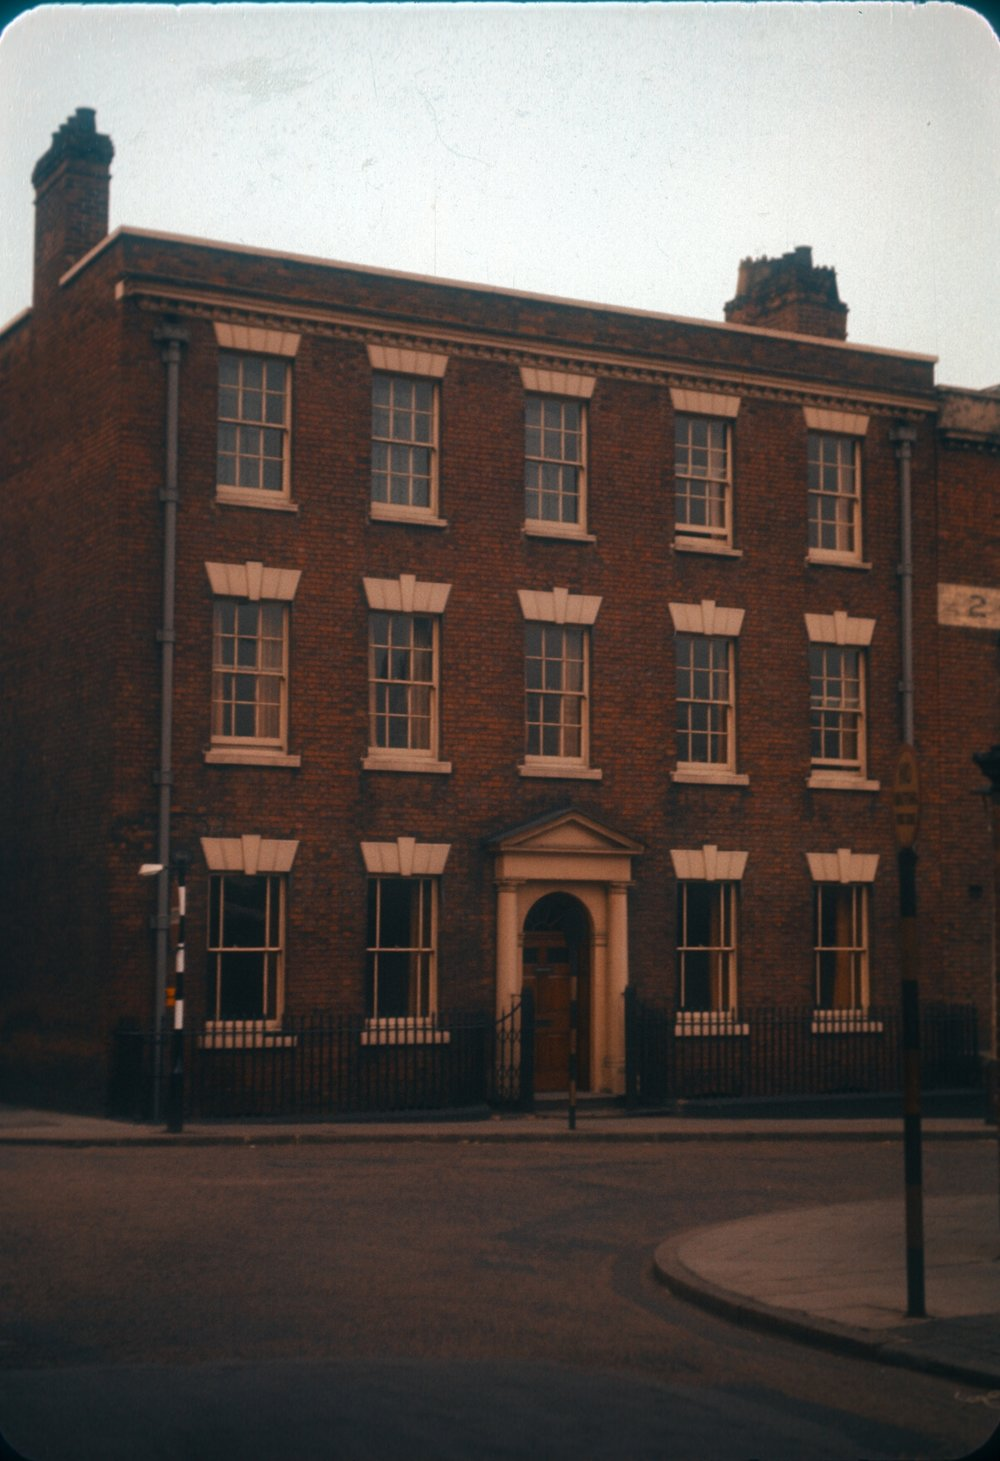 Gun Quarter, St. Mary's Row. Corner of Whittall Street. 25th March 1960